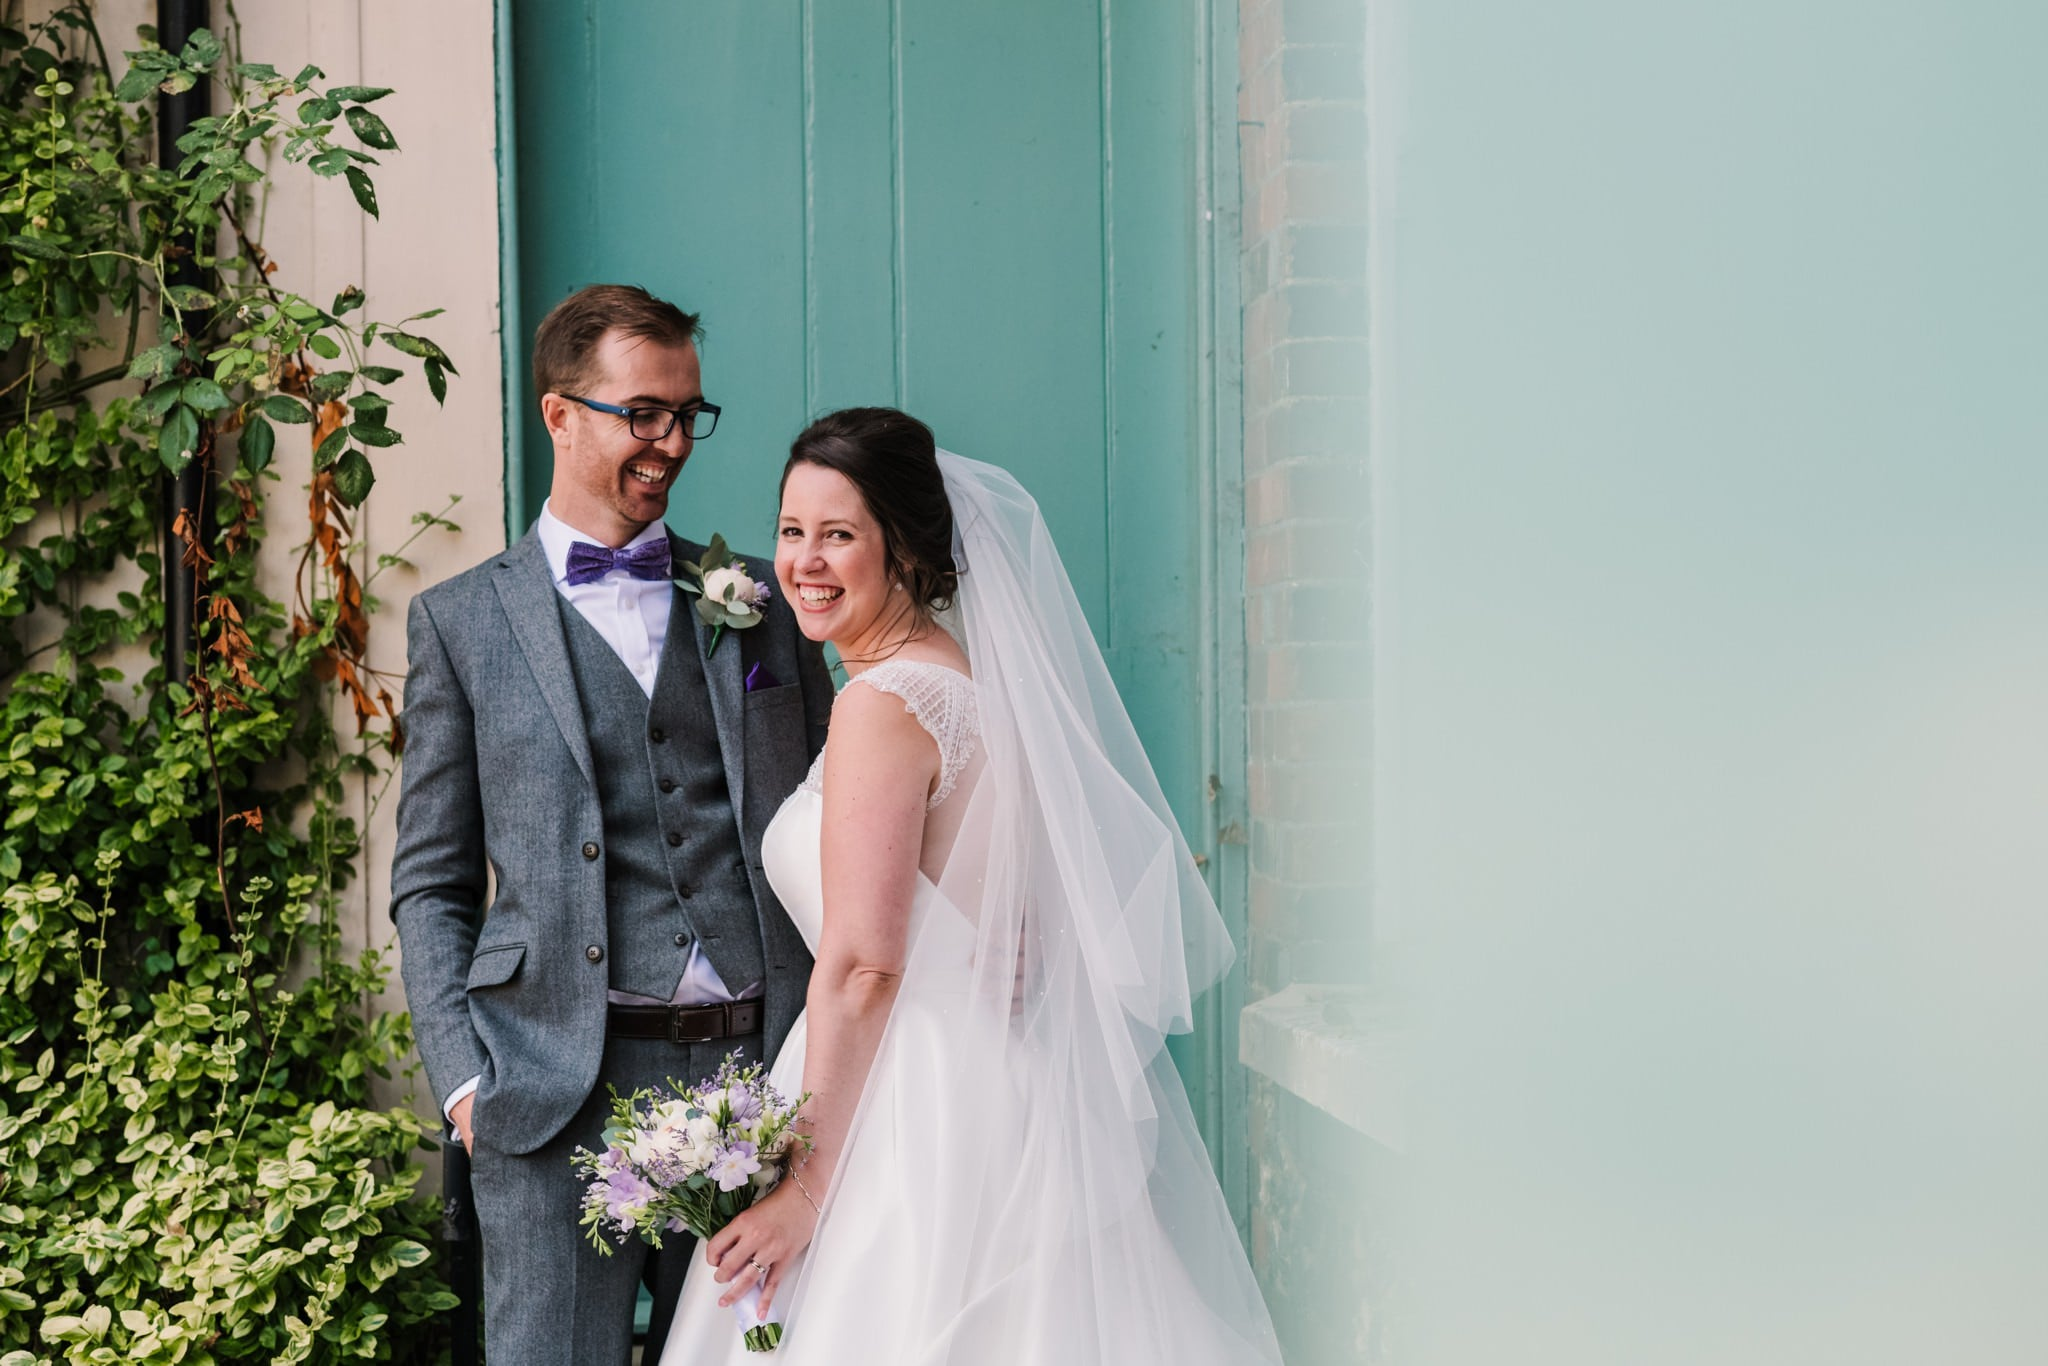 Colourful Dorset wedding photography at Knighton House Wedding